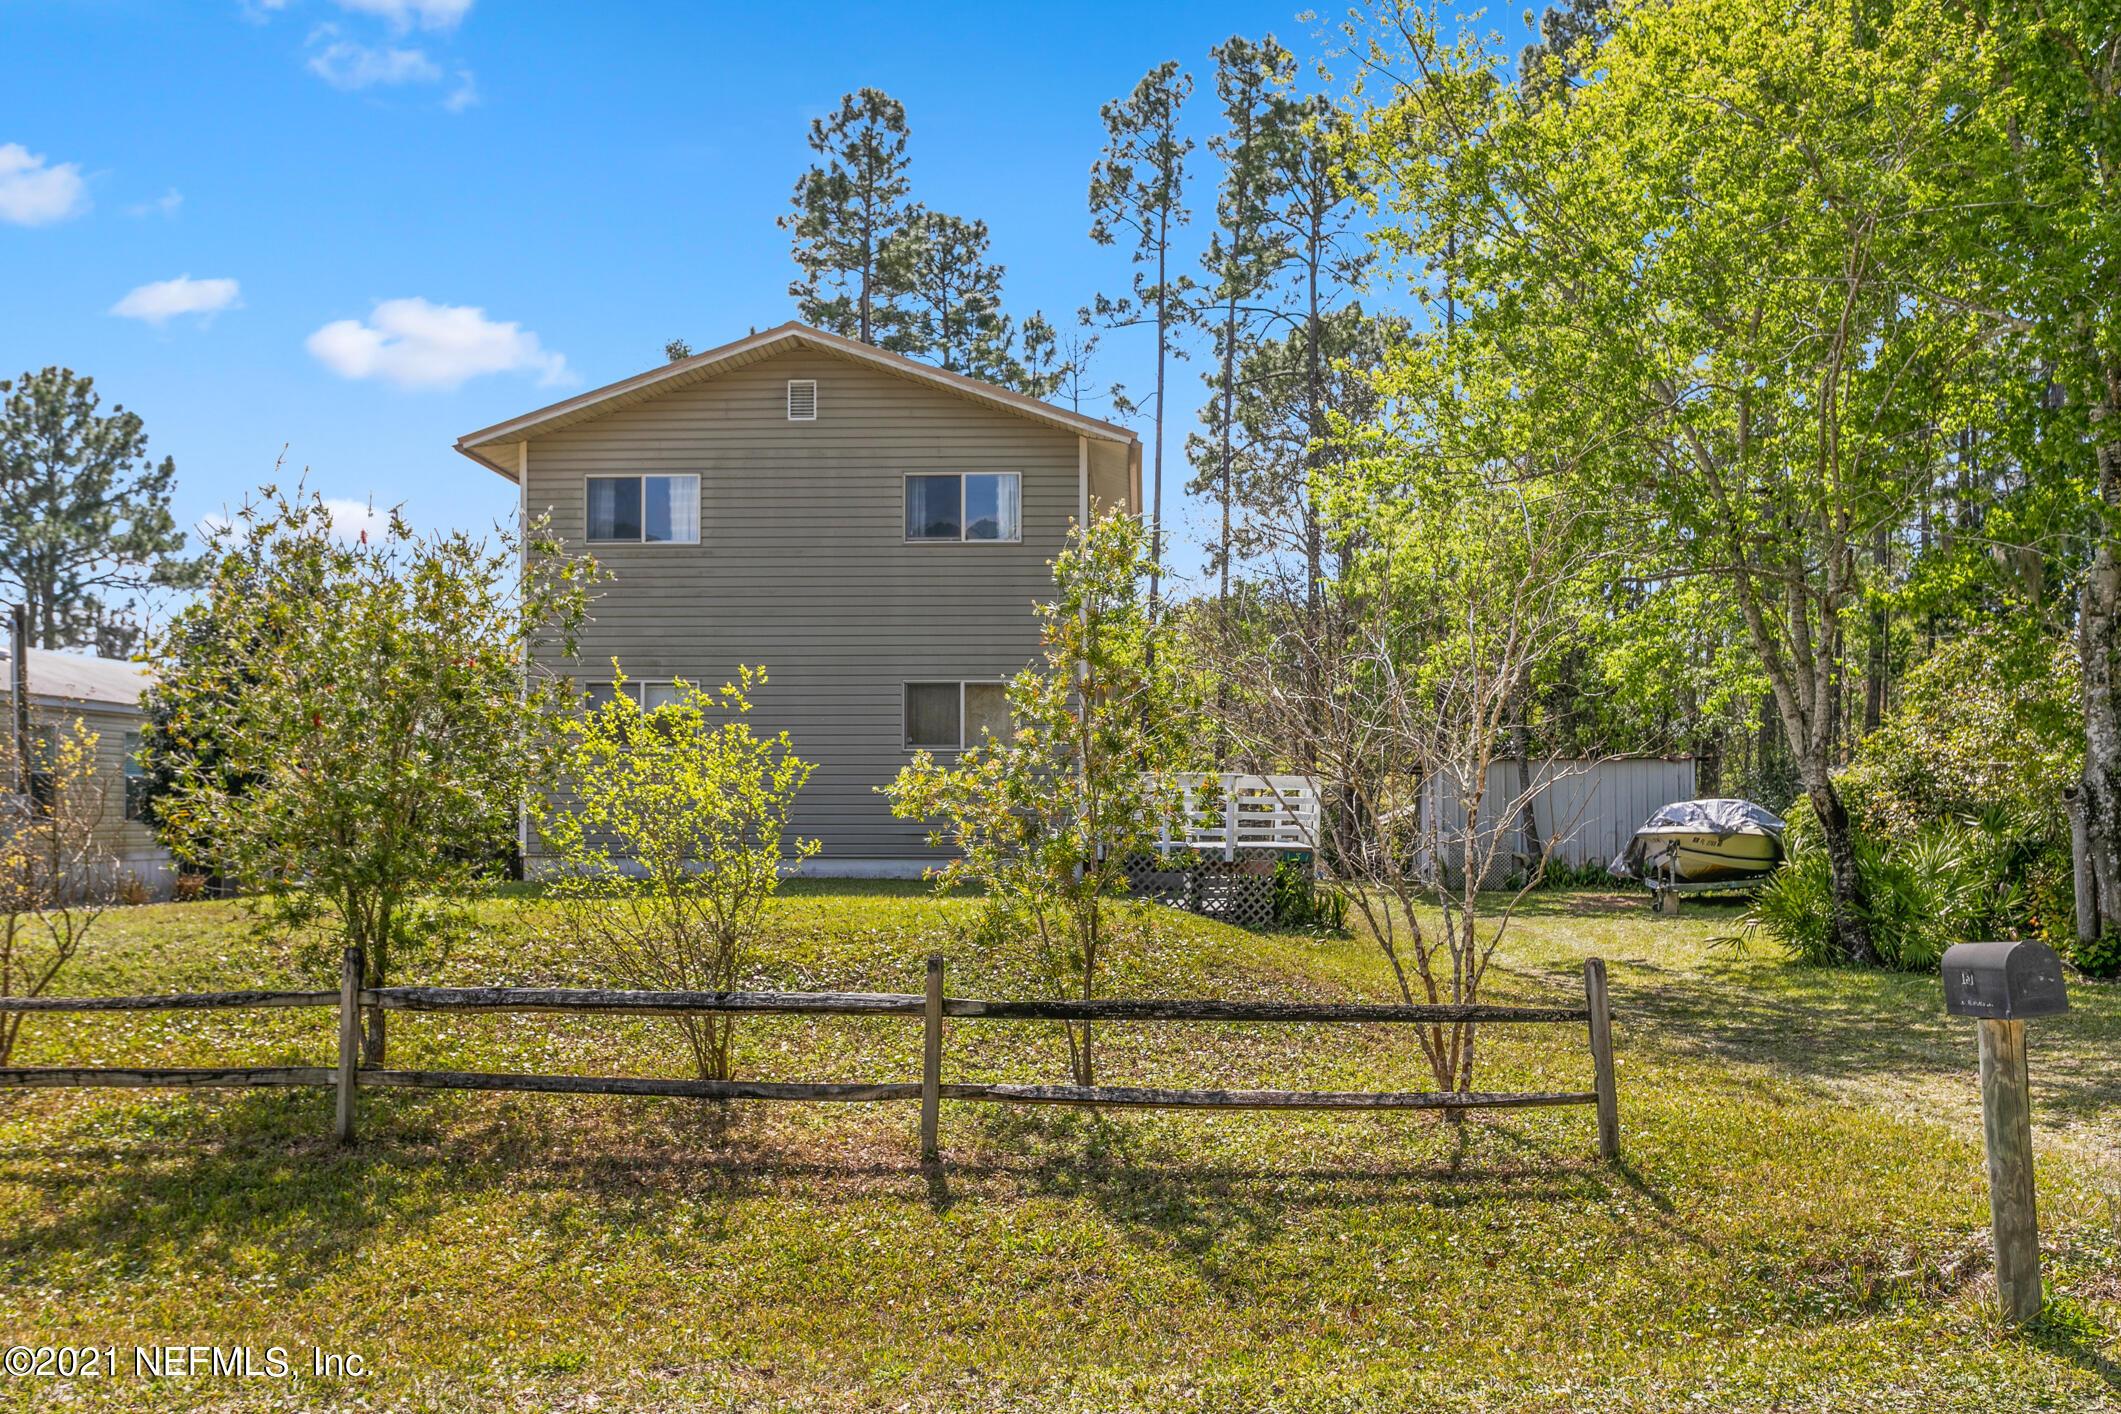 131 KINGFISH, PALATKA, FLORIDA 32177, 2 Bedrooms Bedrooms, ,1 BathroomBathrooms,Residential,For sale,KINGFISH,1099413